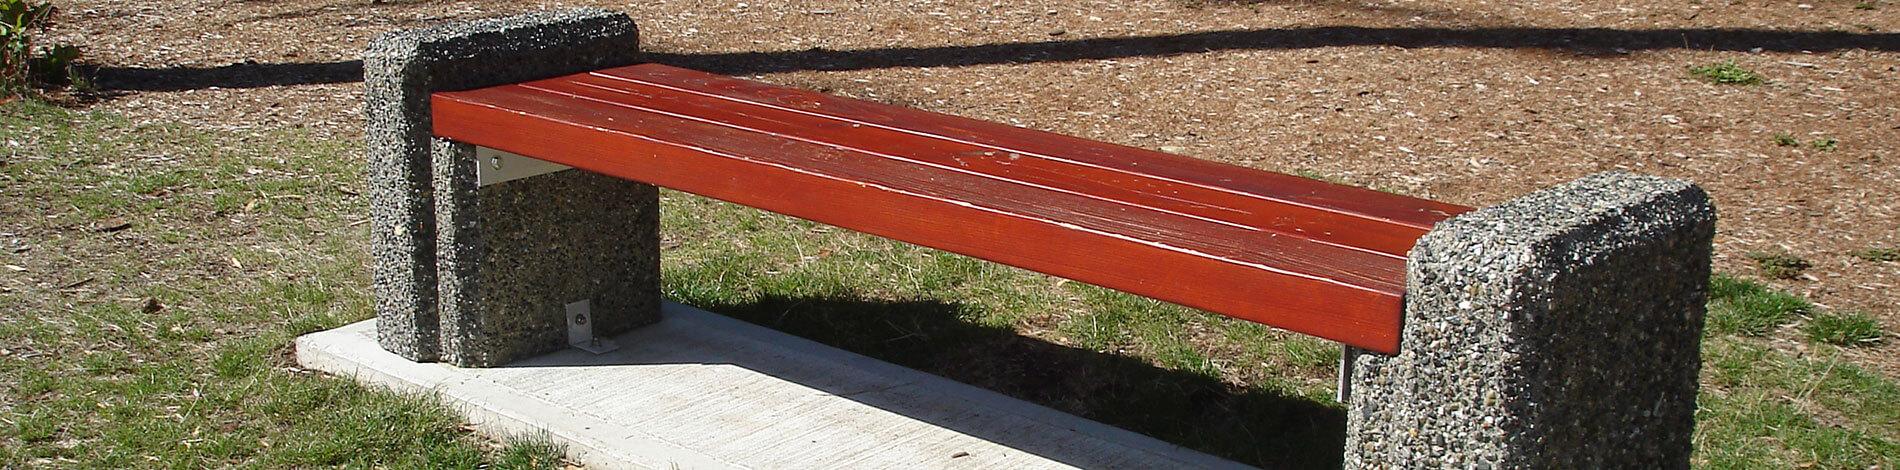 home-slide-bench